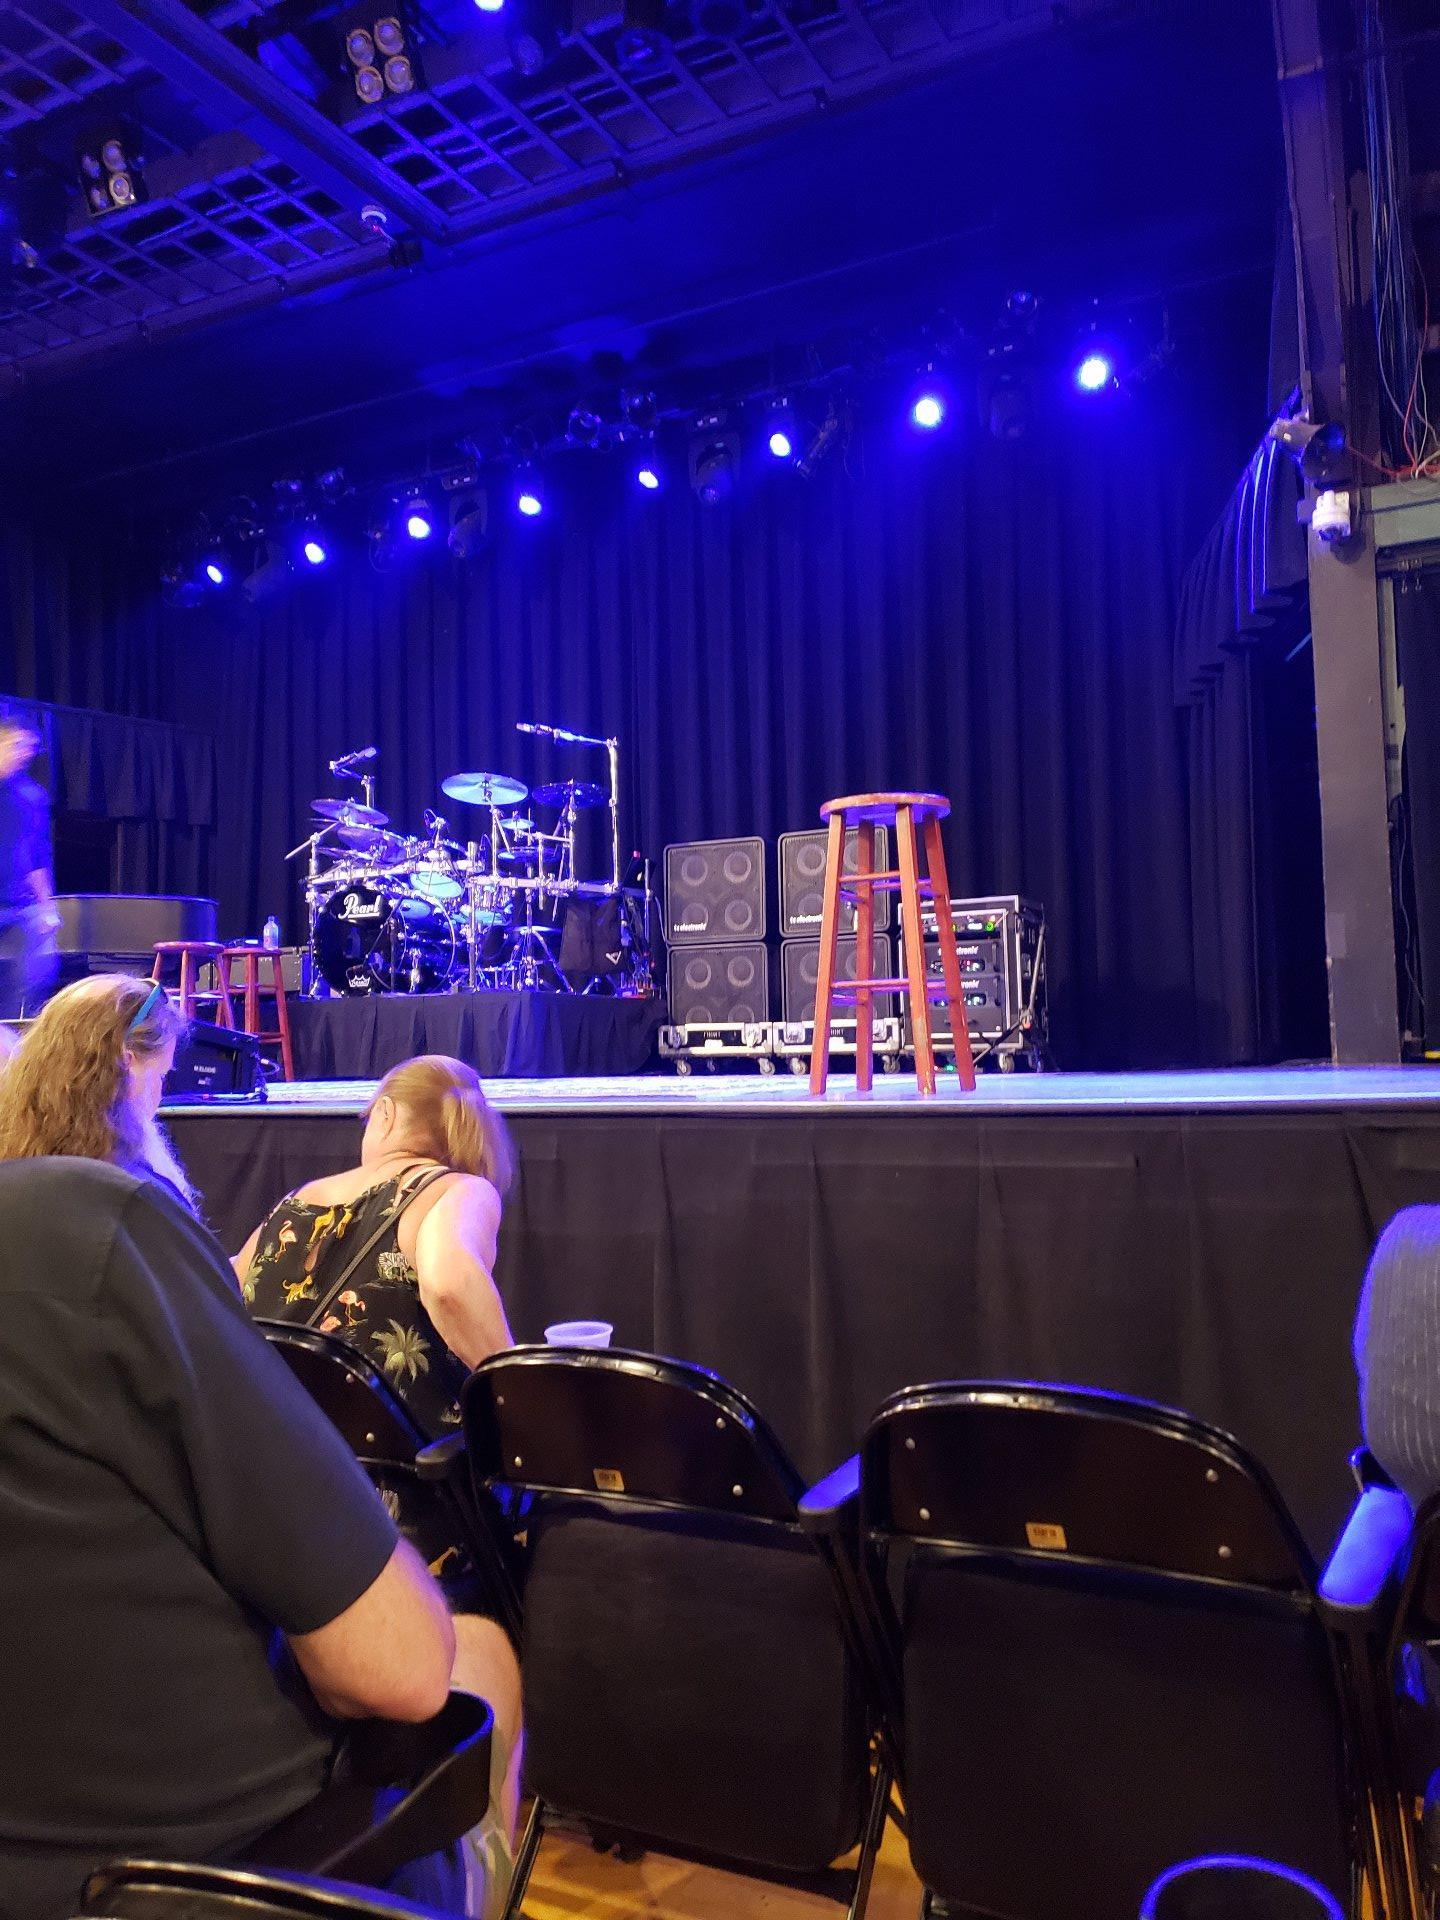 Hampton Beach Casino Ballroom Section Center 1 Row CC Seat 8